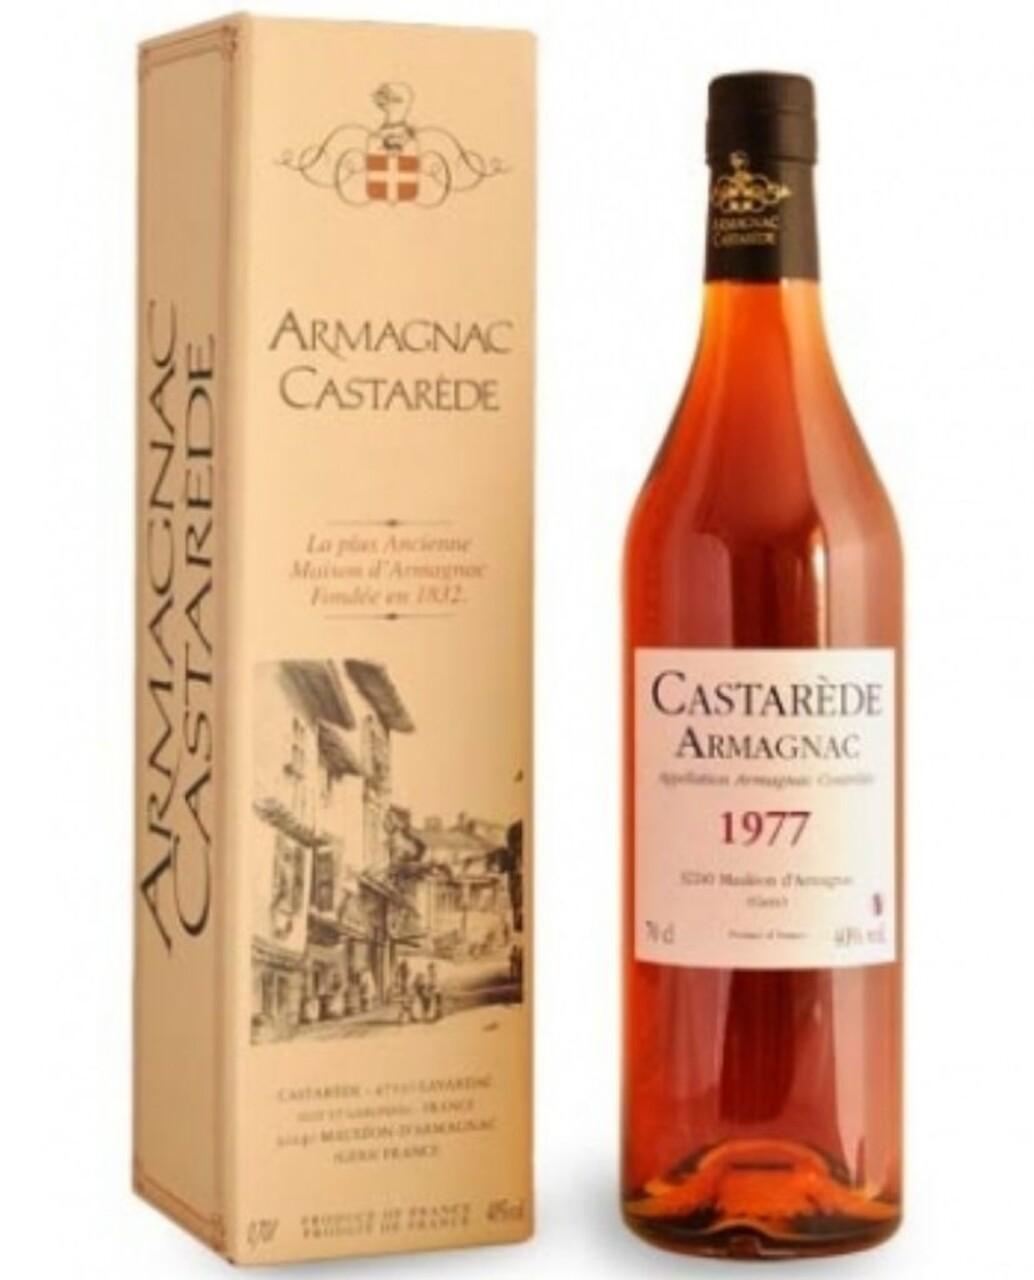 ARMAGNAC CASTAREDE 1977